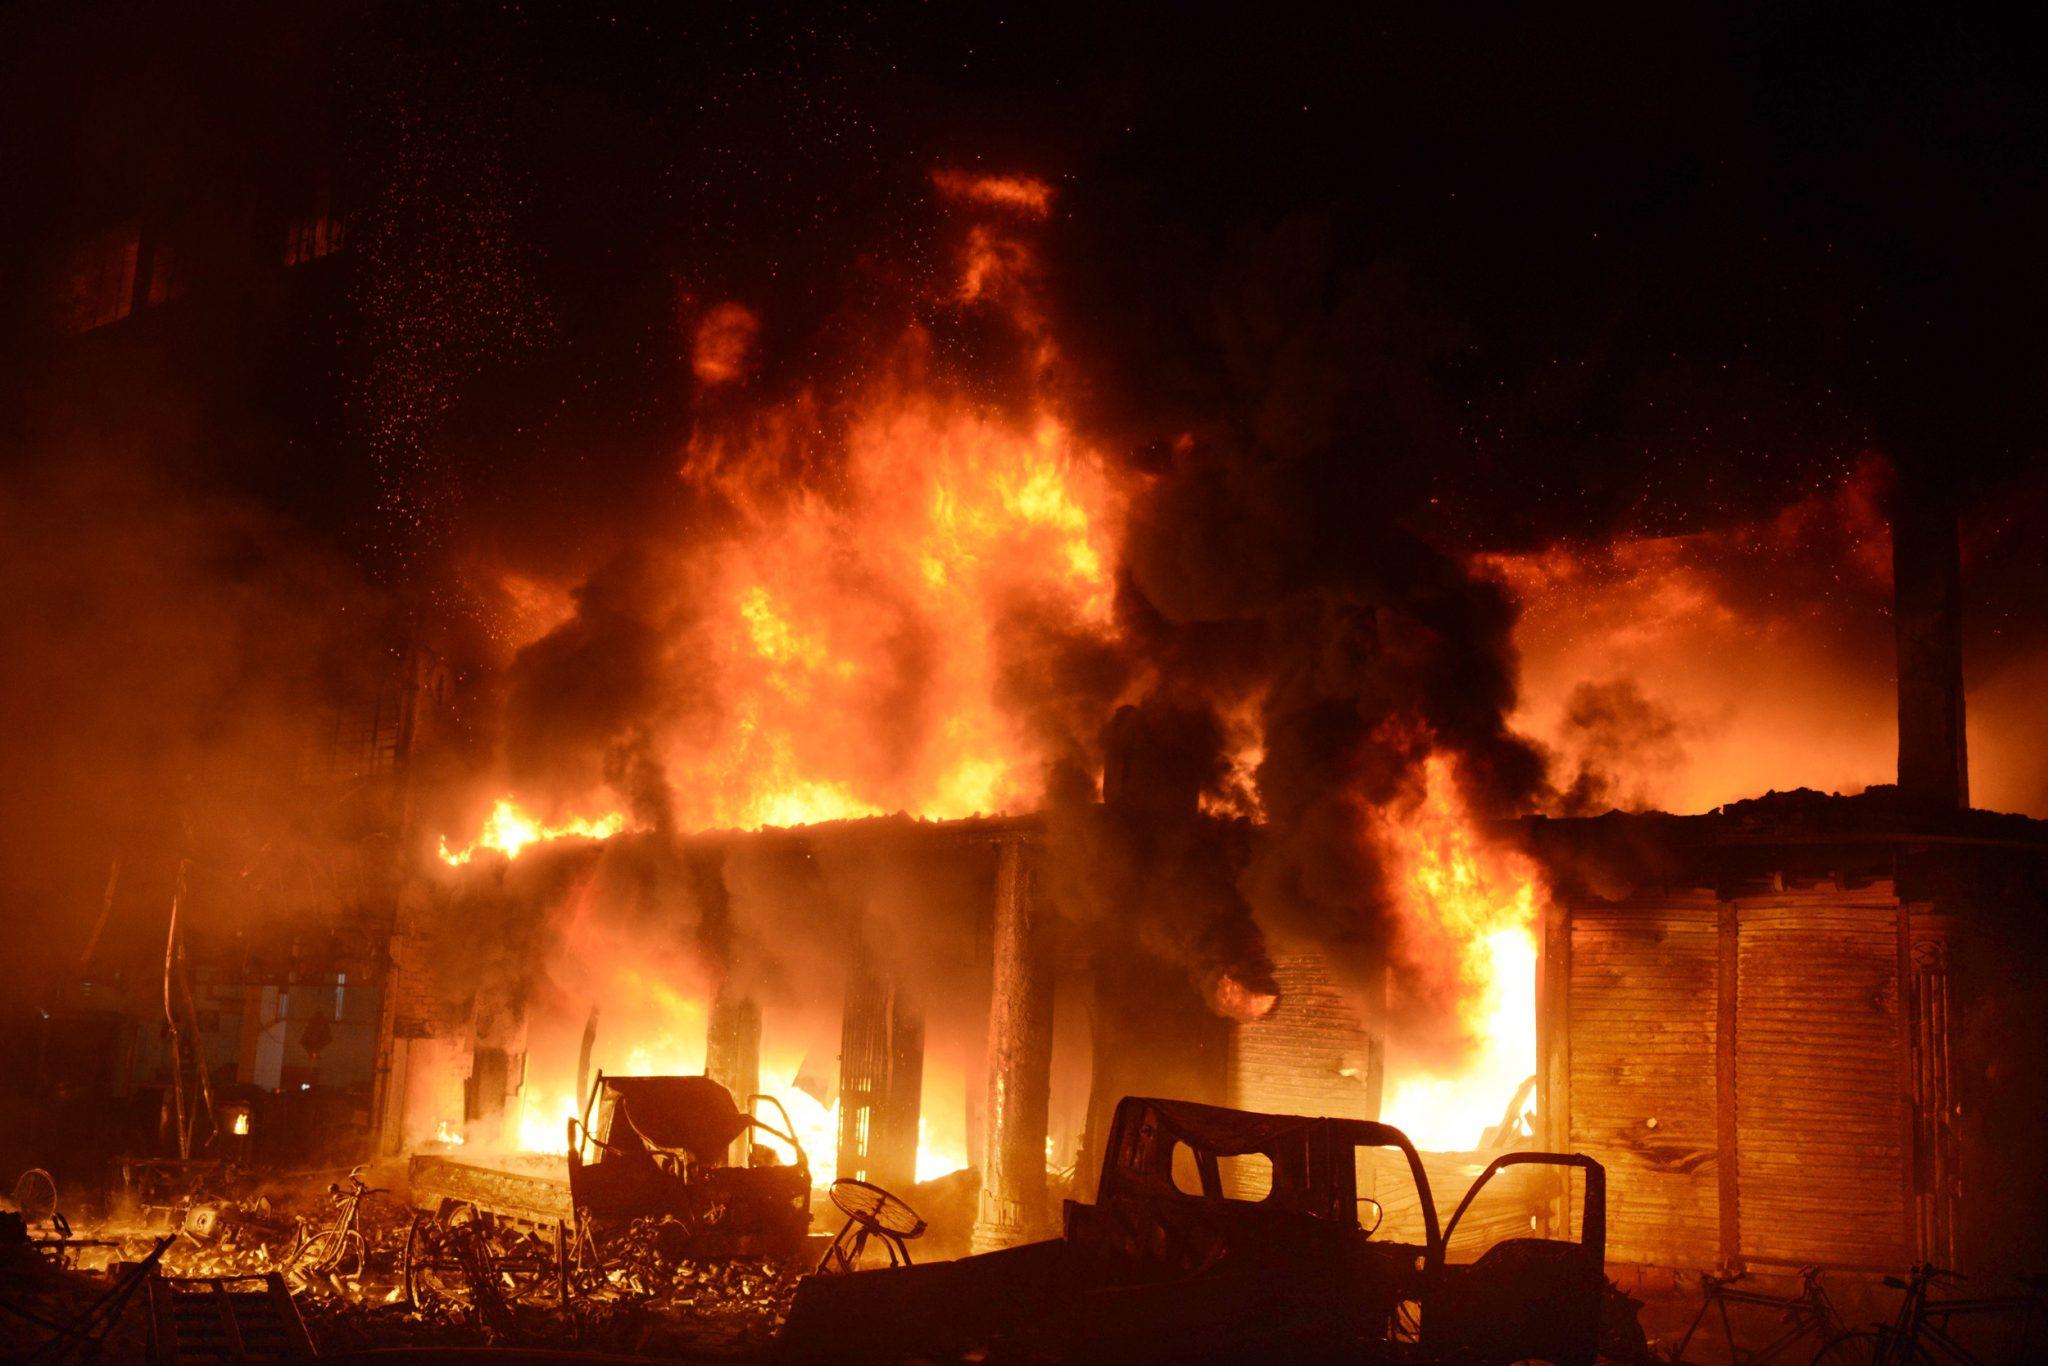 Fire Guts Oldest Part Of Bangladeshi Capital, Killing Dozens